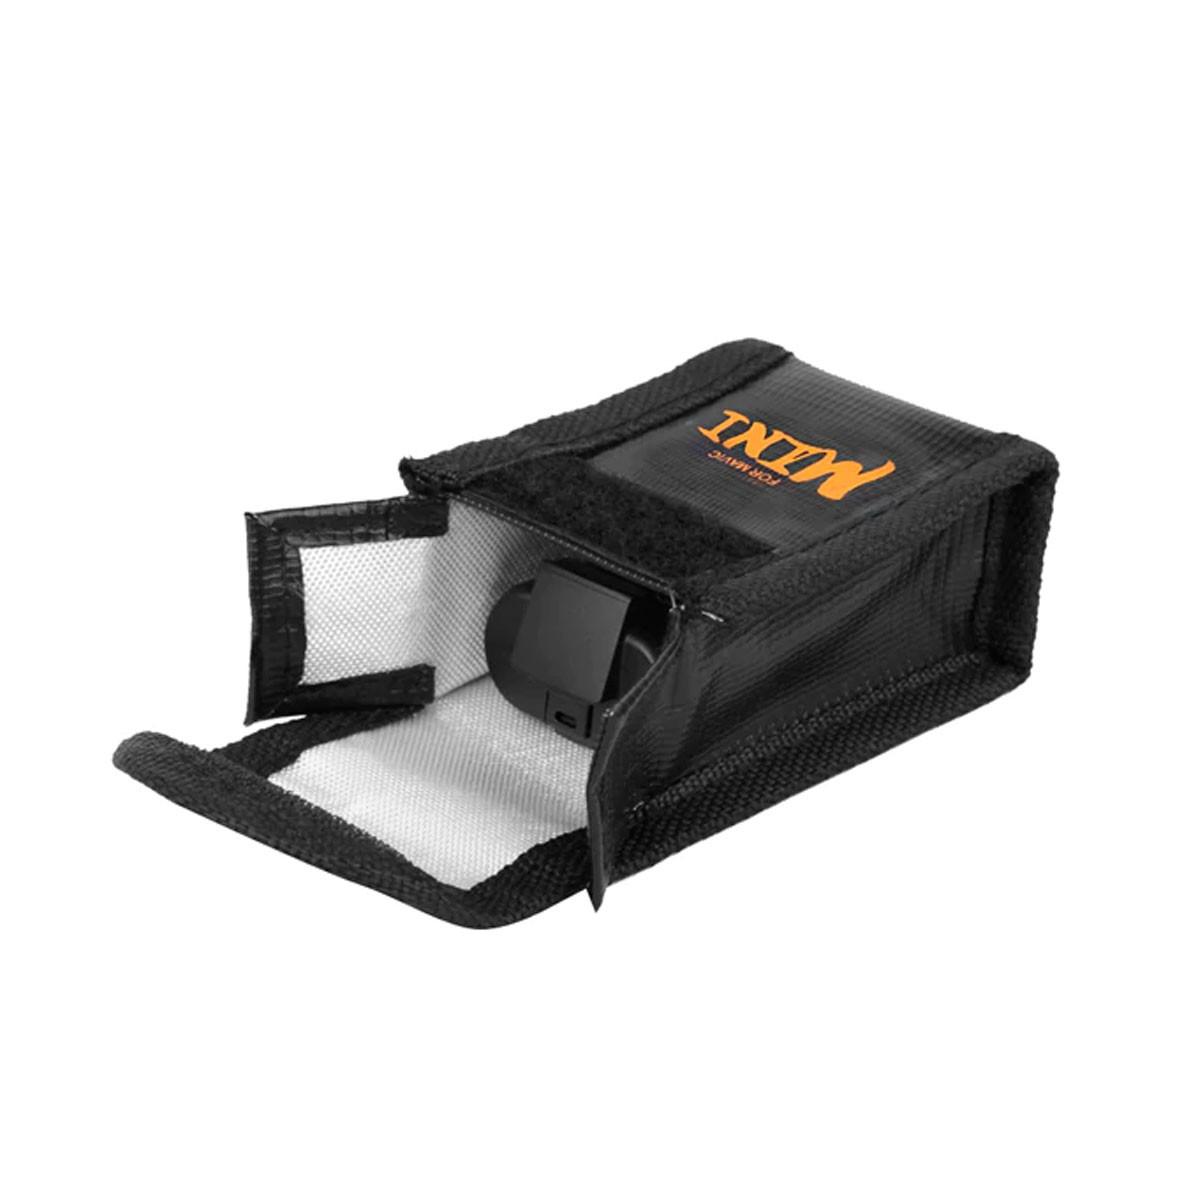 Saco Anti Chama e Explosão para Bateria - Drone DJI Mavic Mini - 1 Bateria